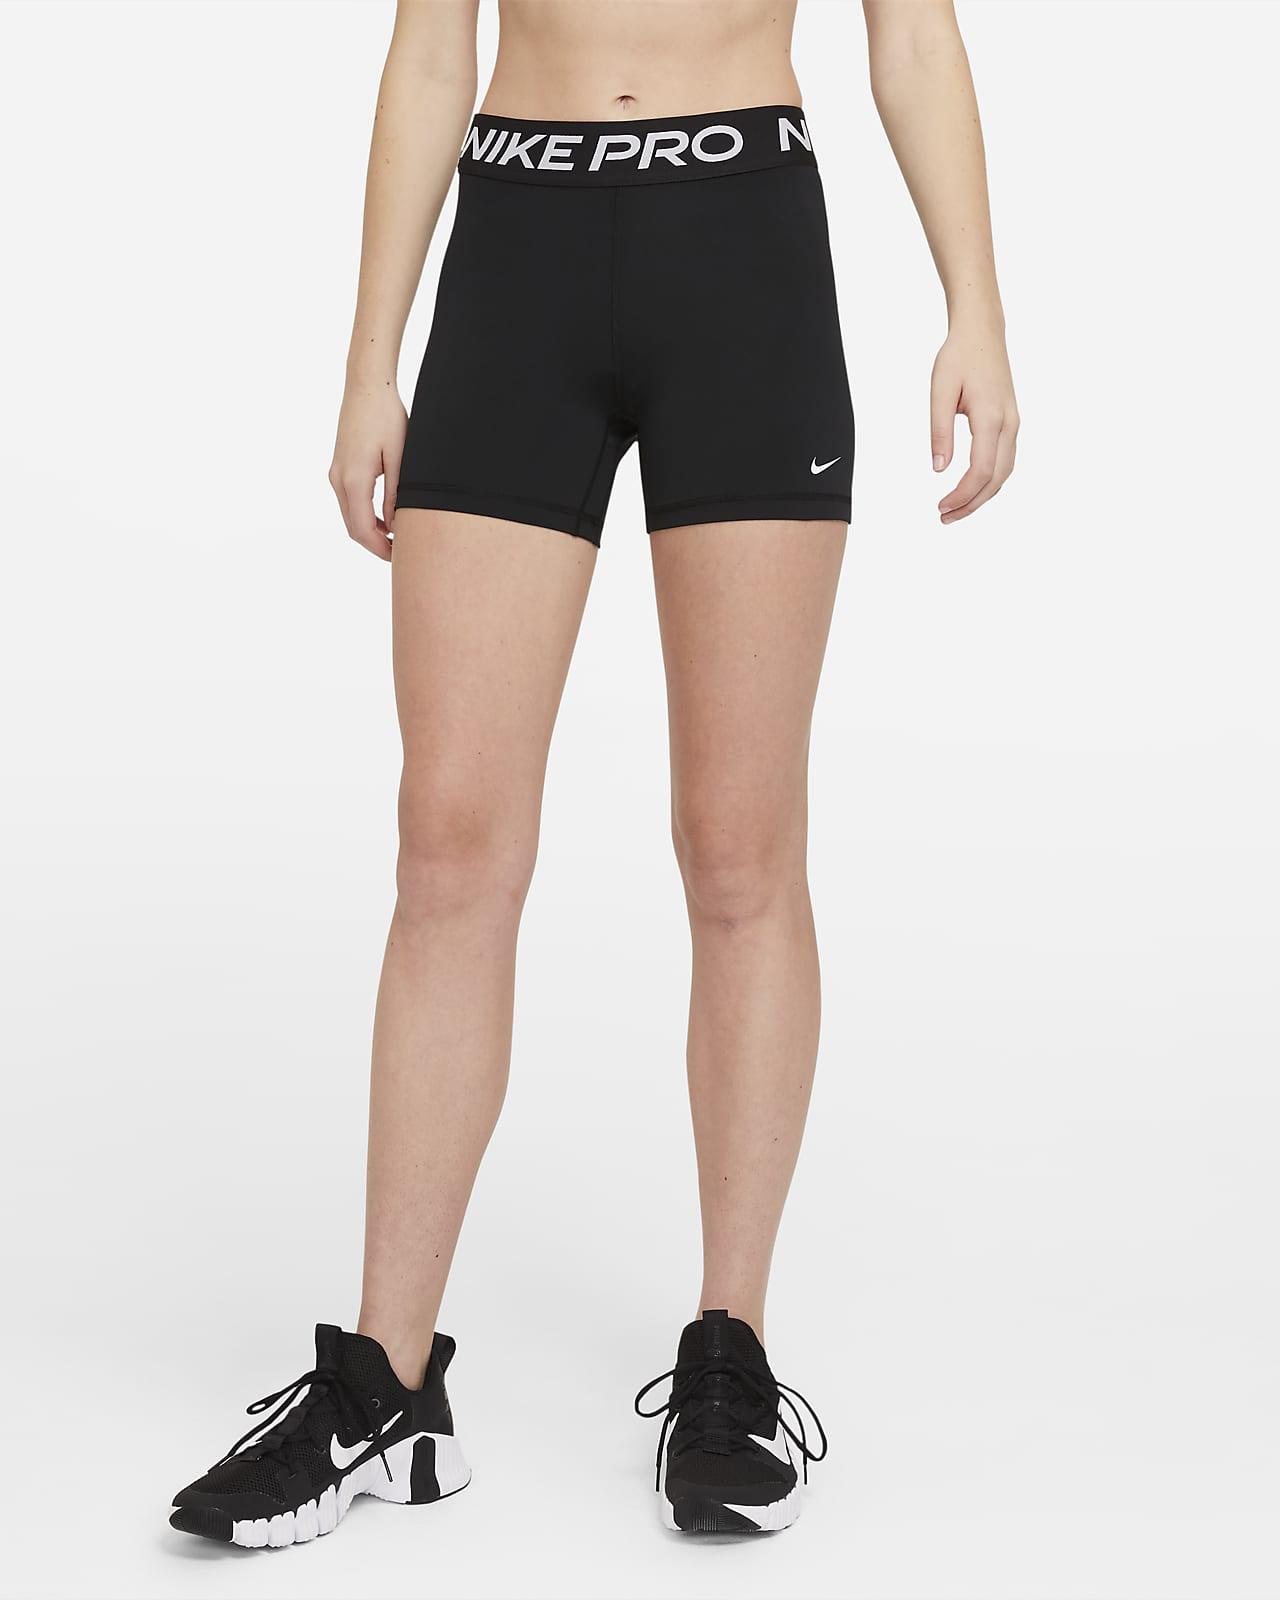 Dámské 13cm kraťasy Nike Pro365